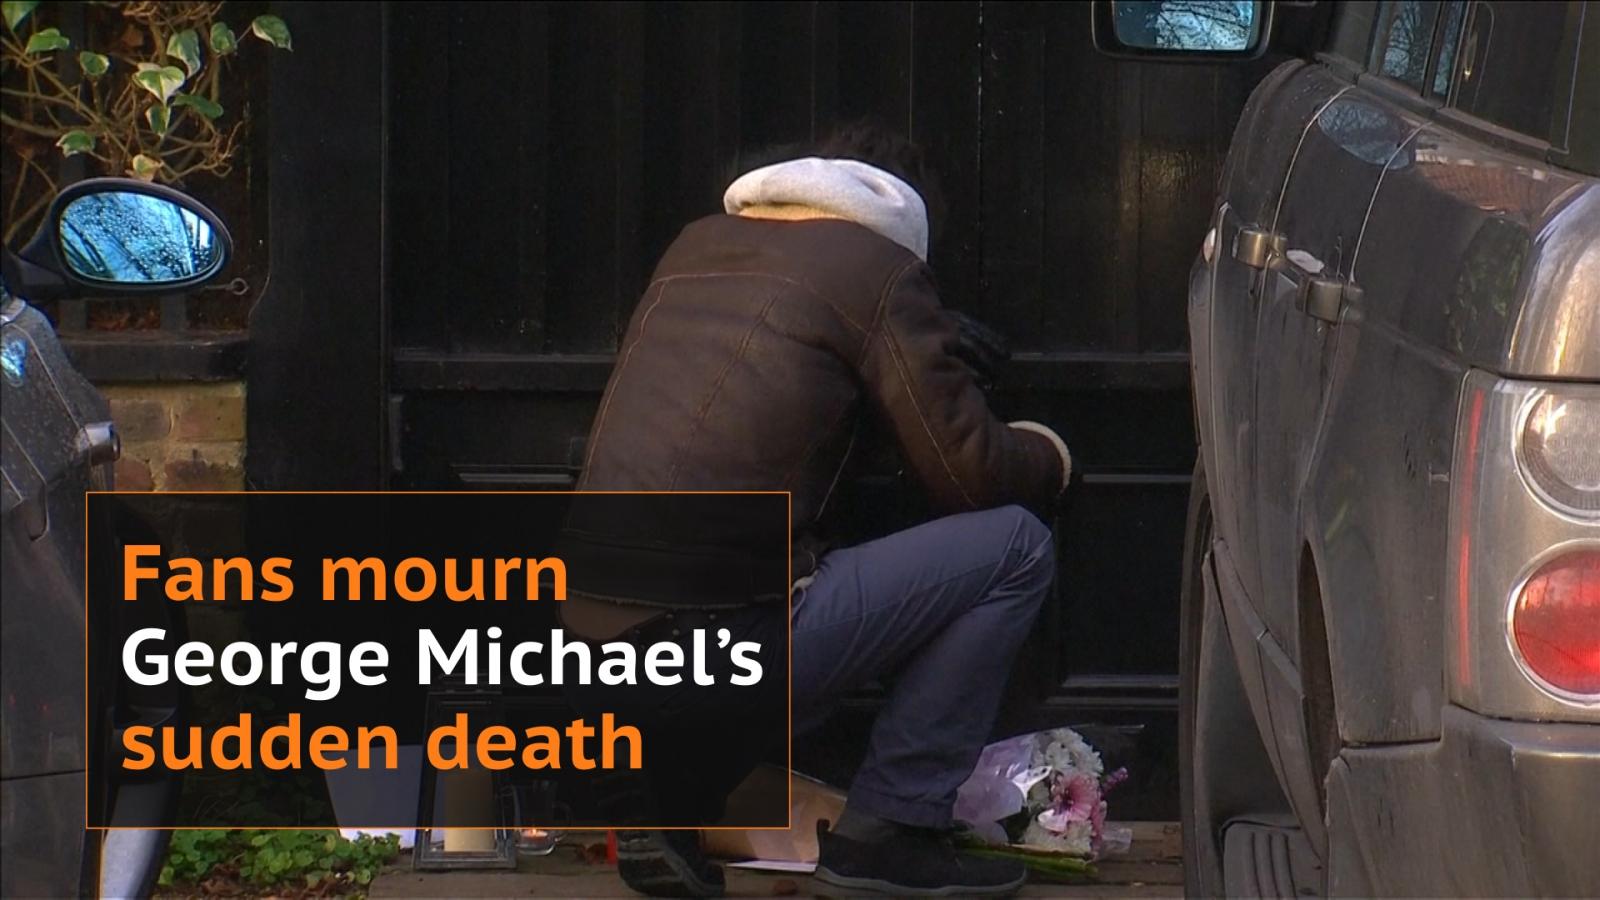 George Michael: Fans mourn death